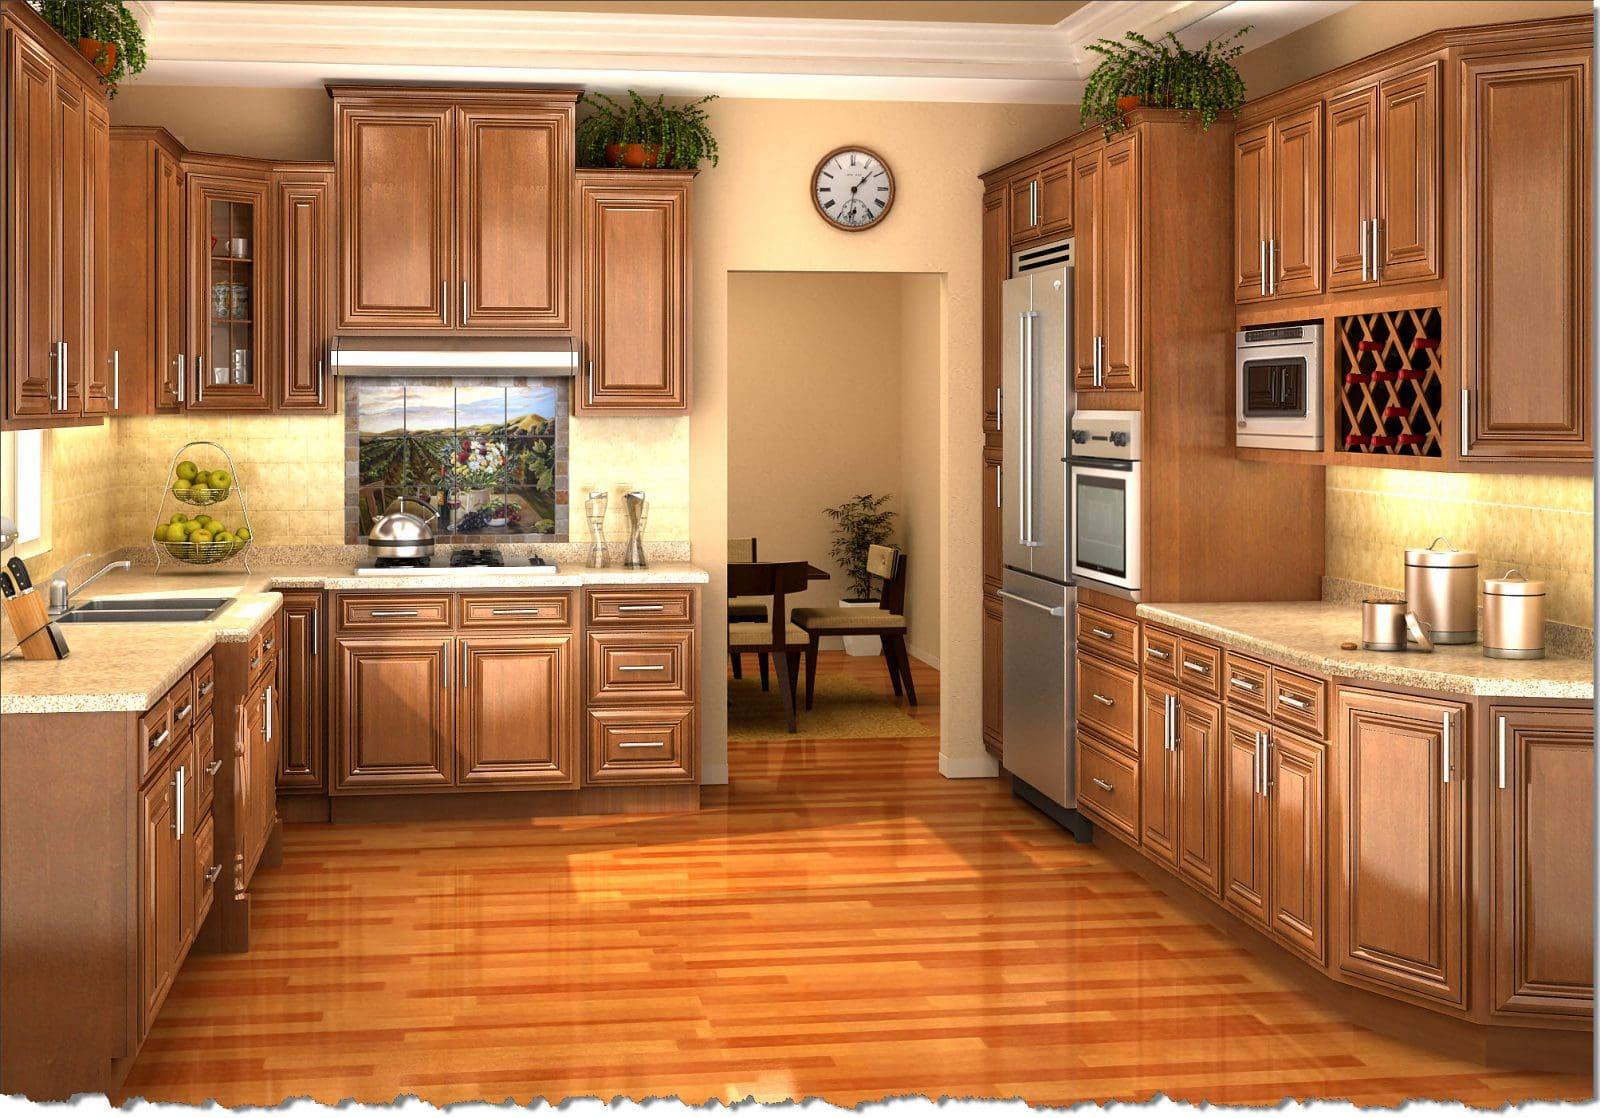 Houston kitchen cabinets affordable custom cabinets in for Cheap kitchen cabinets houston tx